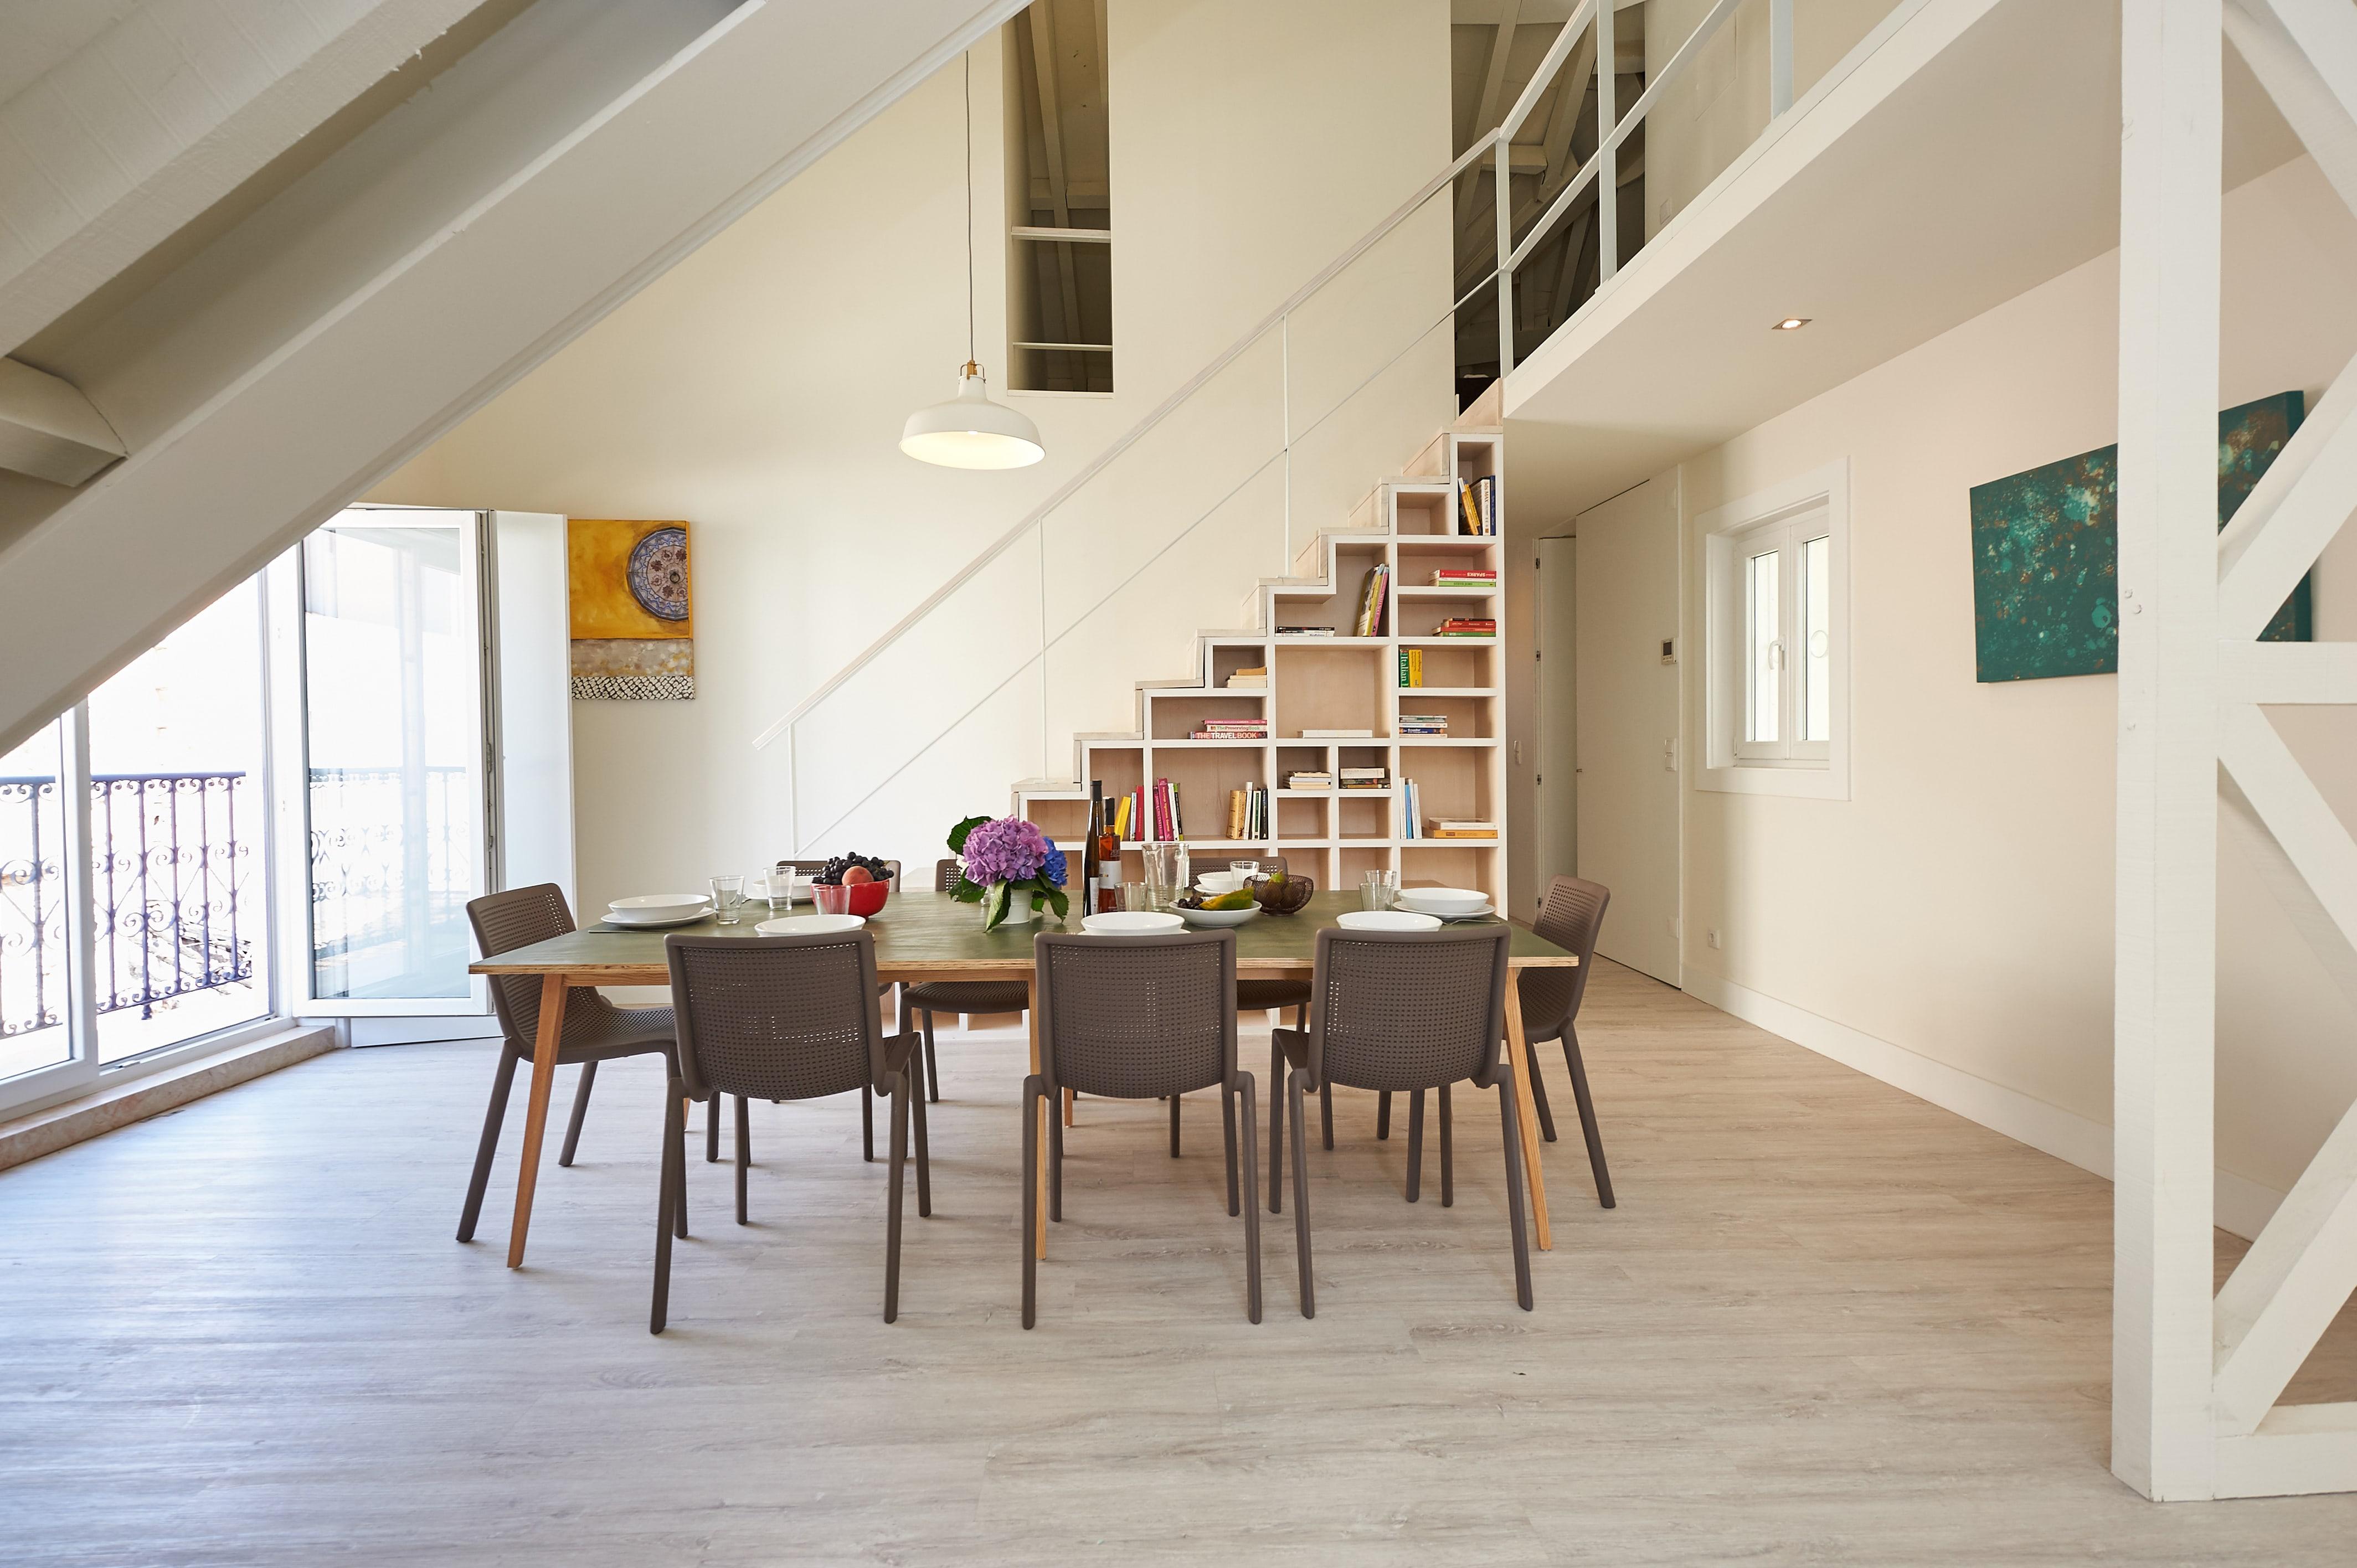 Portugal ways santos azulejos apartments online booking for Azulejos on line